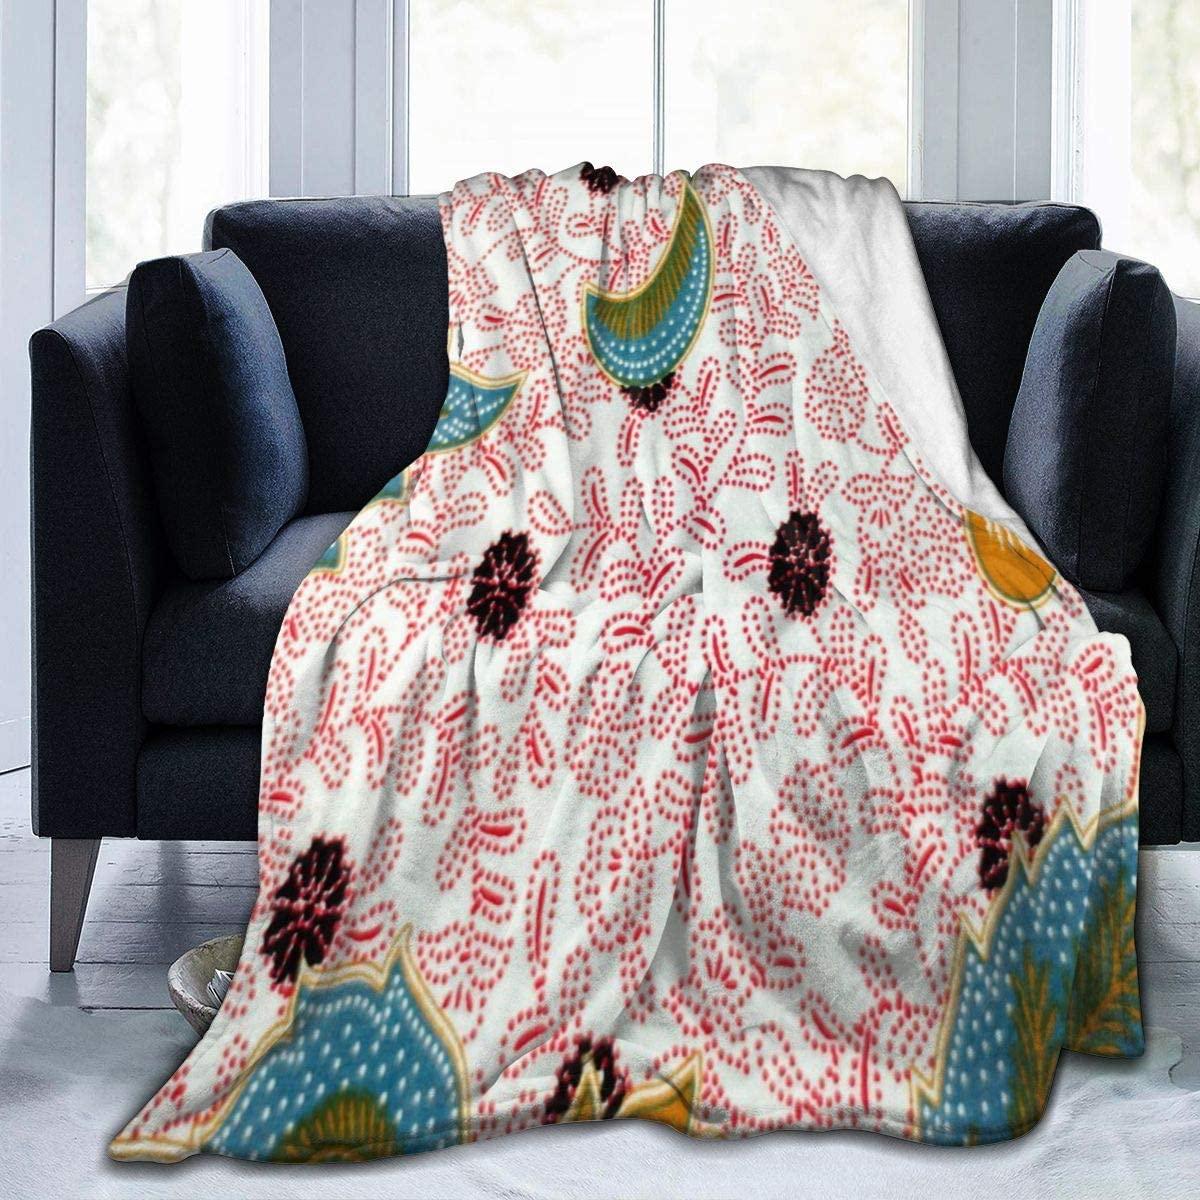 Micro Fleece Plush Soft Baby Blanket Paisley Old Beautiful Batik Fluffy Warm Toddler Bed/Crib Blanket Lightweight Flannel Daycare Nap Kids Sleeping Tummy Time Throw Blanket Girls Boy Kid/Baby